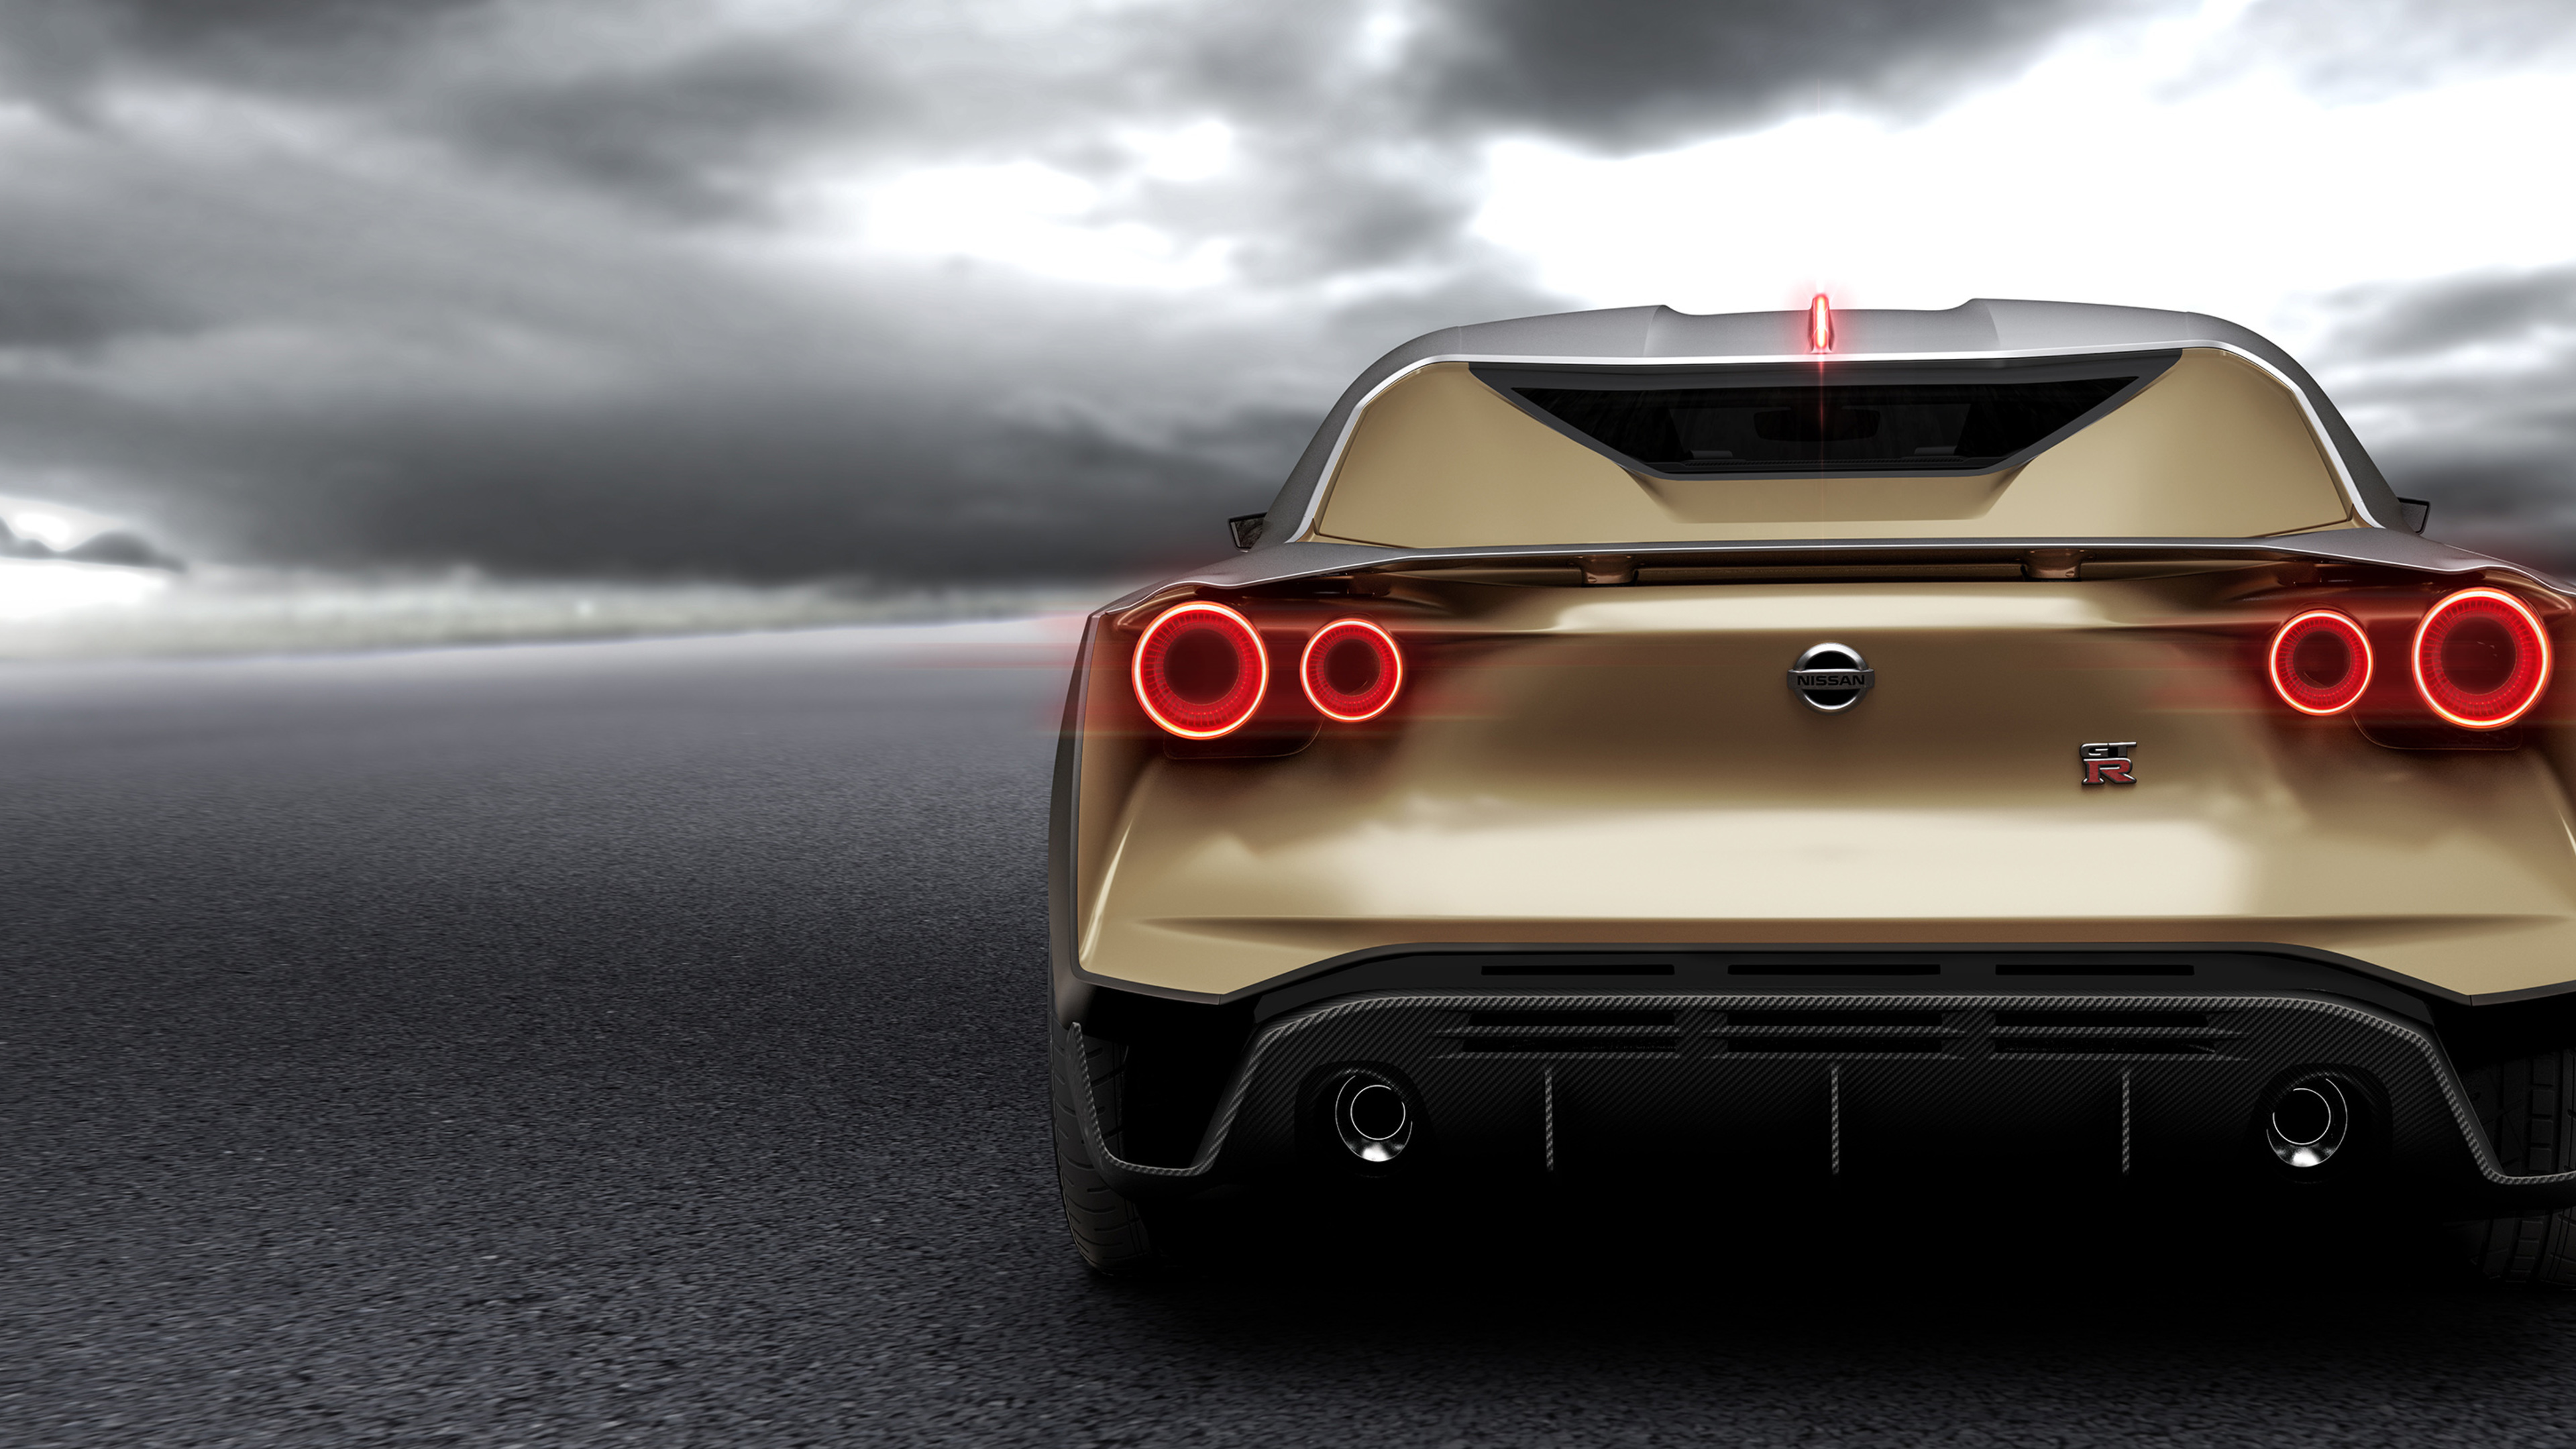 nissan gt r50 concept 2018 rear view 1539112176 - Nissan GT R50 Concept 2018 Rear View - nissan wallpapers, nissan gt r50 wallpapers, hd-wallpapers, concept cars wallpapers, 4k-wallpapers, 2018 cars wallpapers